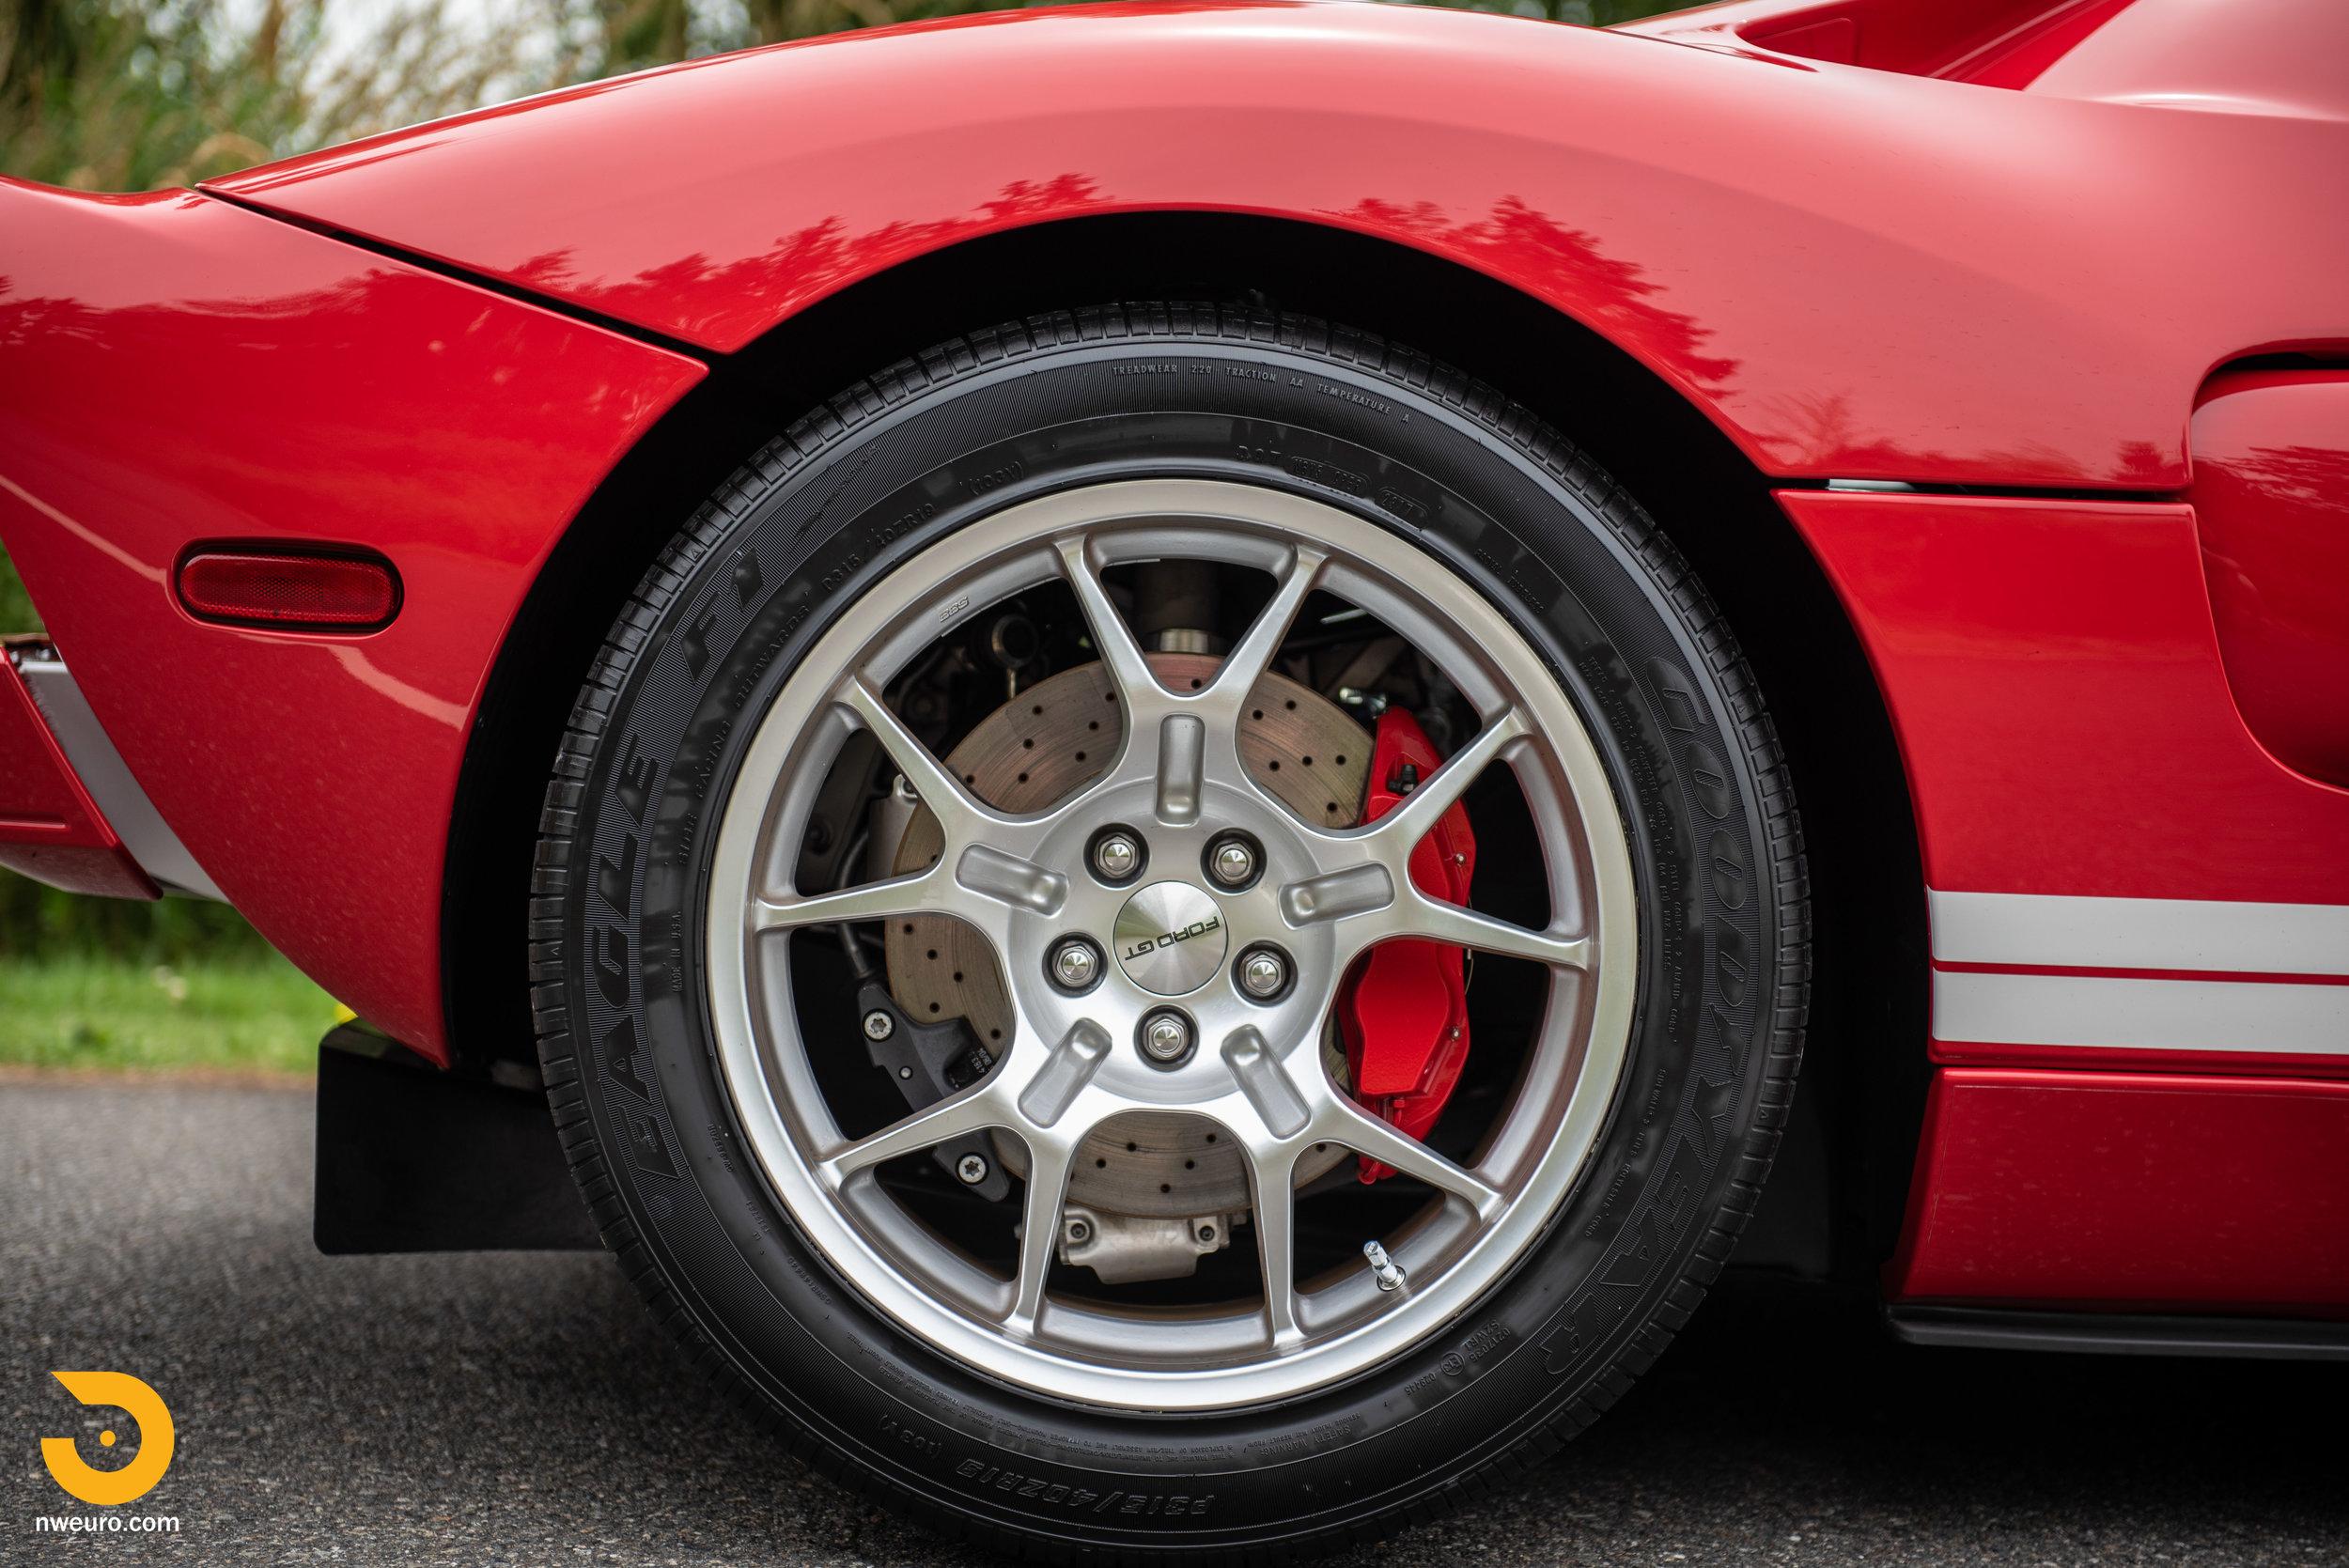 2005 Ford GT Red-97.jpg